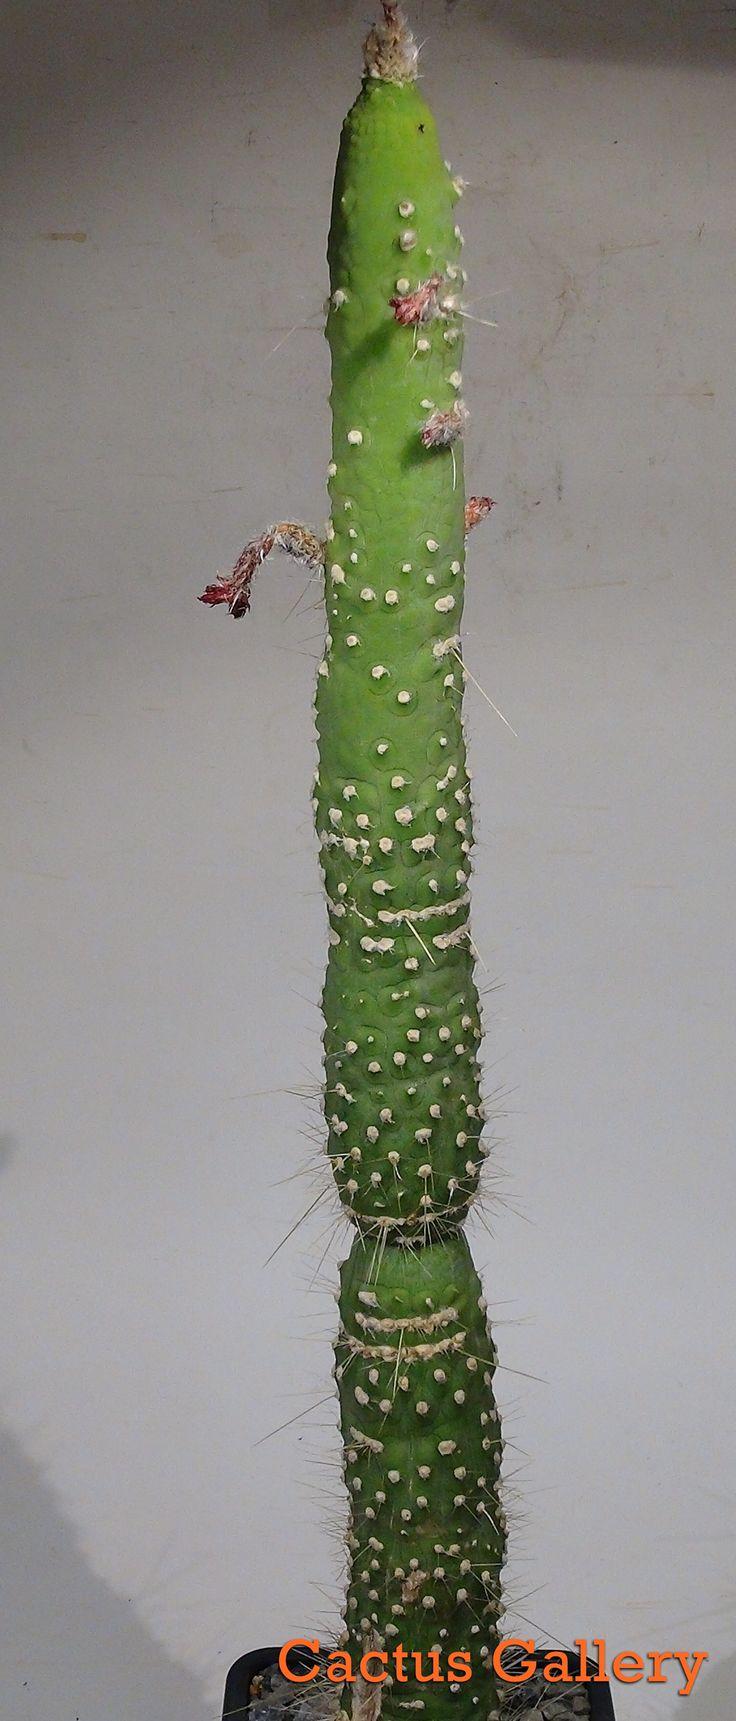 cleistocactus strausii monstruoso